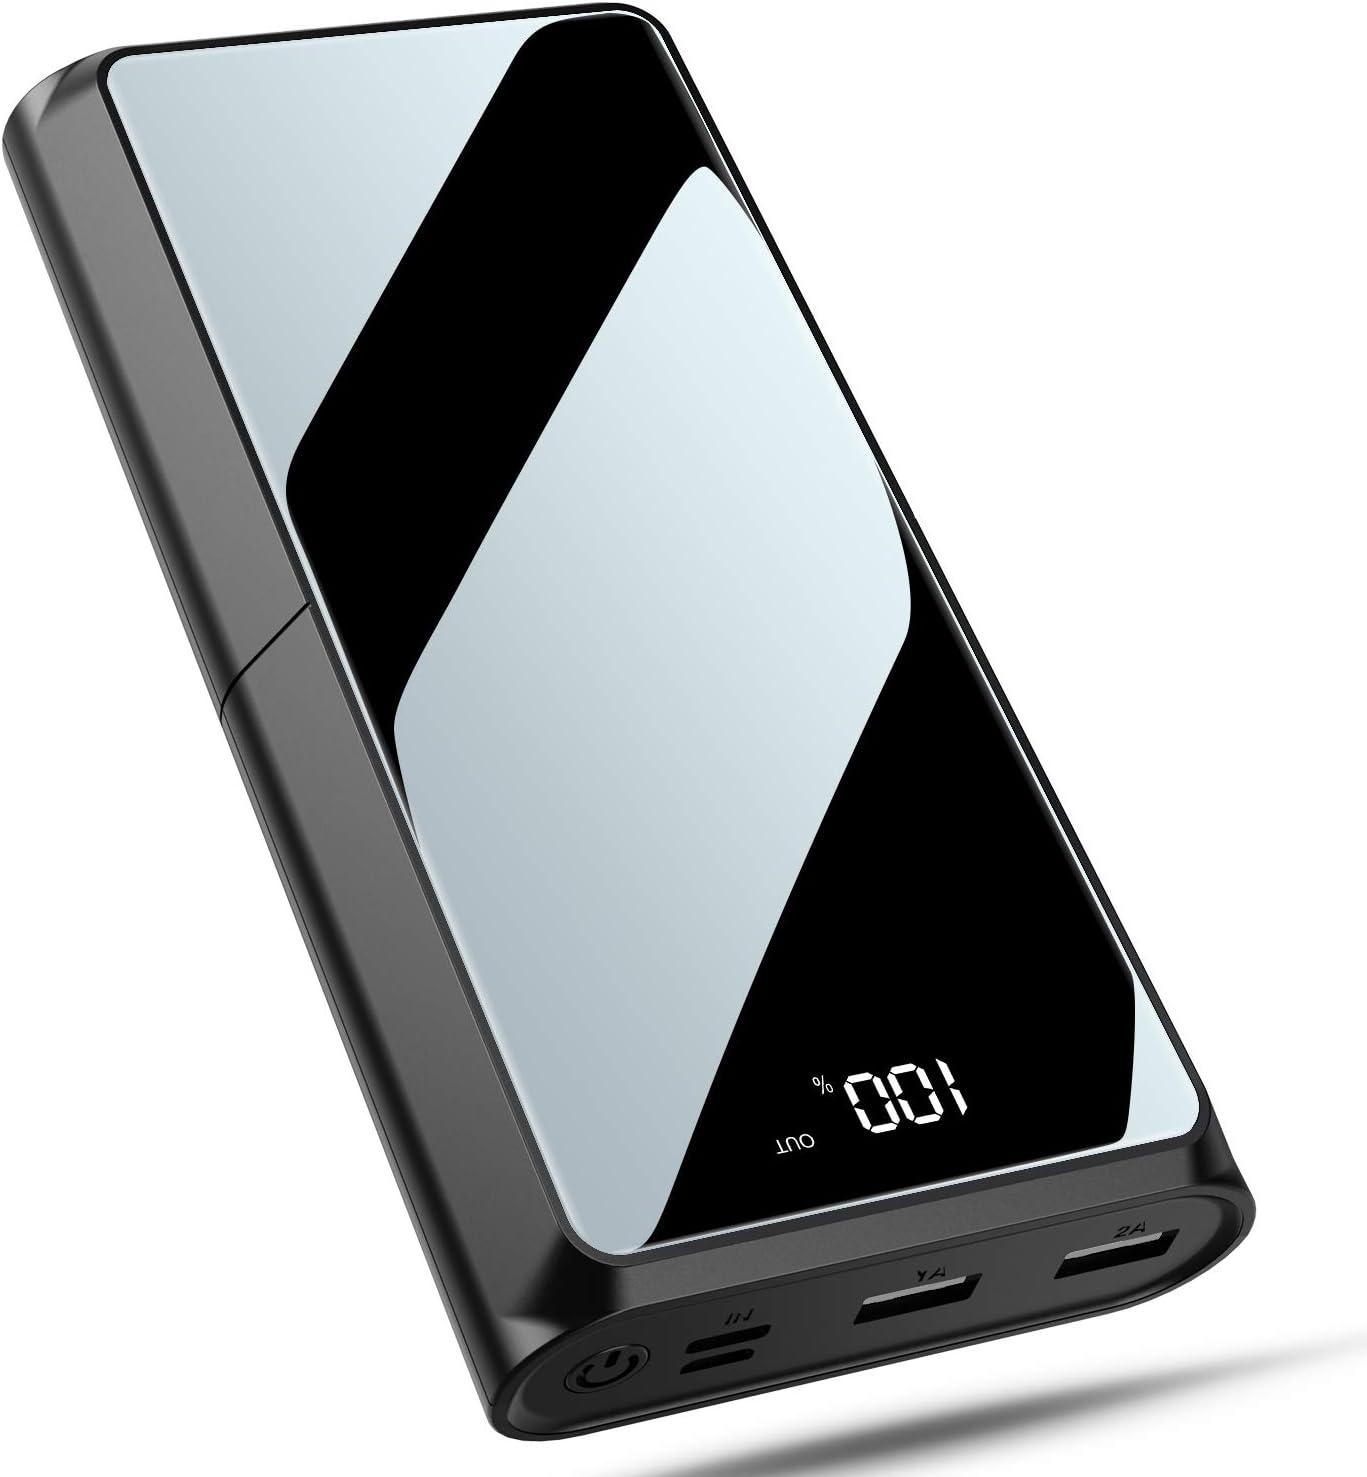 Bewahly Batería Externa 20000mAh, USB C 18W PD Carga Rápida Power Bank Cargador Portátil, Bateria Portatil para Movil con Pantalla LCD, 3 Salida & 2 Entrada para iPhone, Samsung, Huawei y Más - Ne